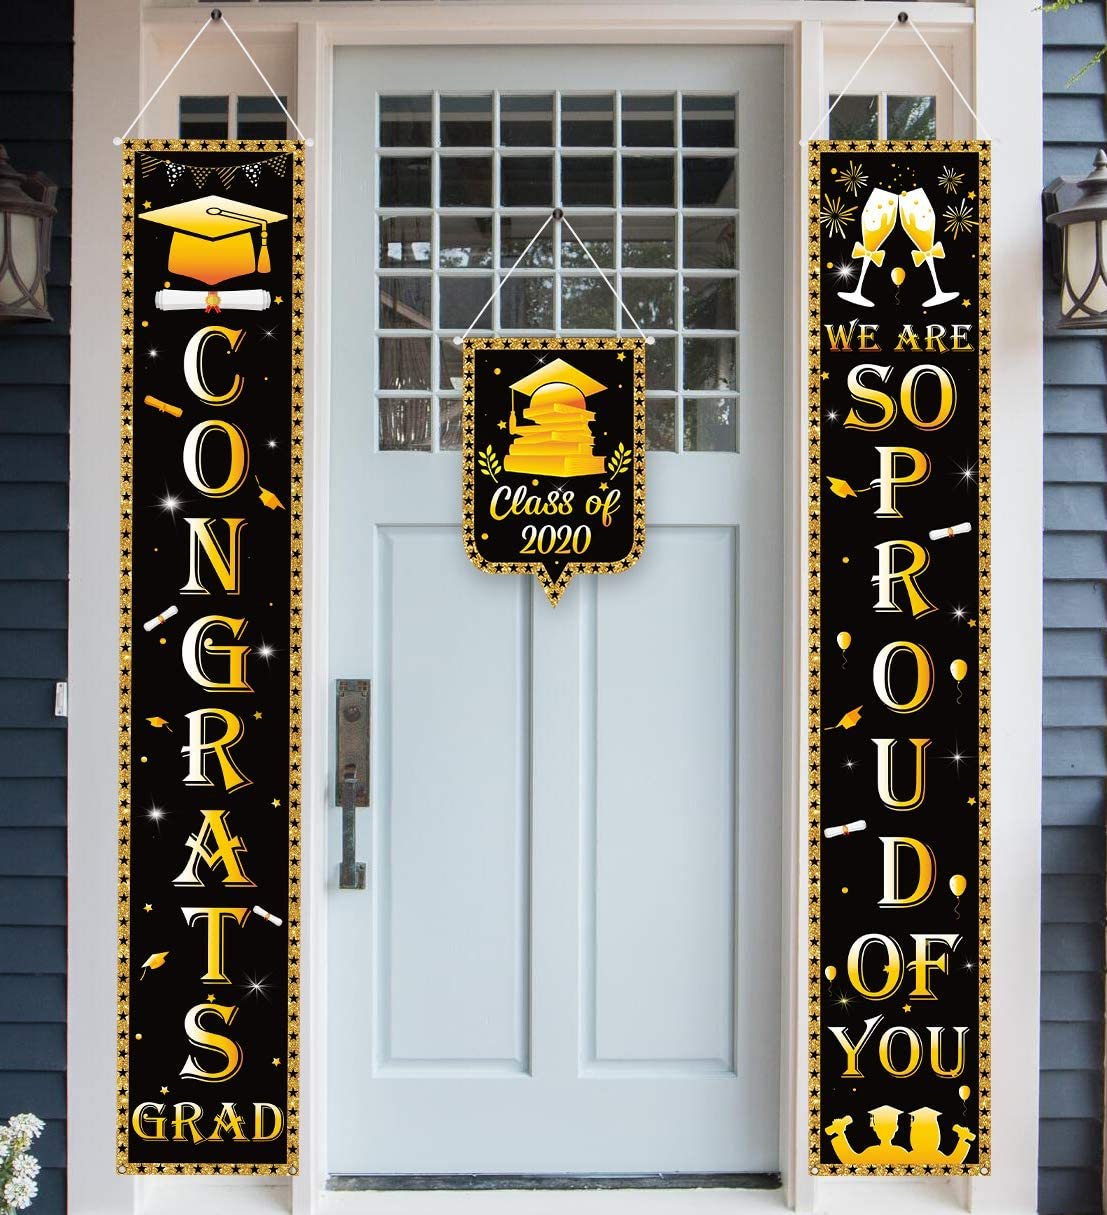 luck sea 3PCS Graduation Banners Party Supplies 2020 Decorations Door Porch Sign- Congrats Grad & So Proud of You Hanging Wall Decor Indoor Outdoor